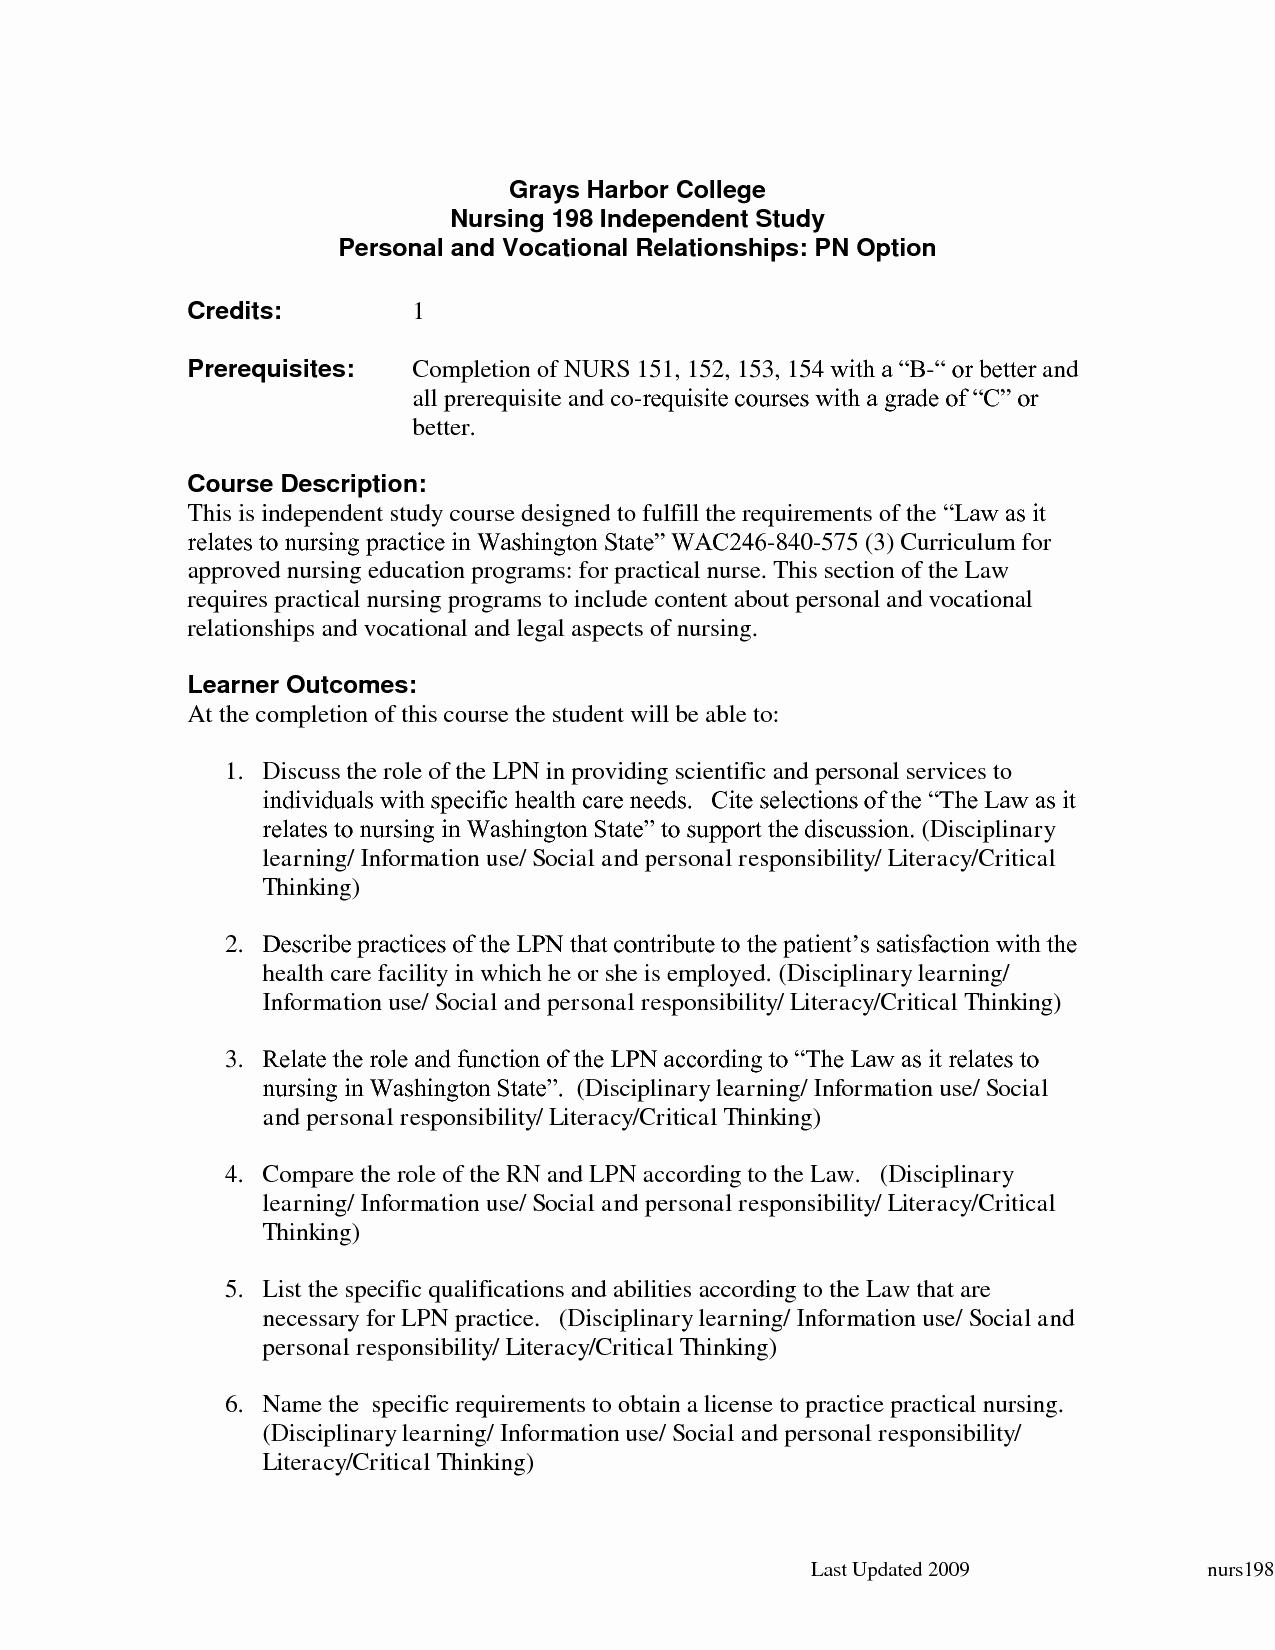 Nursing Resume Examples 2015 Sidemcicek